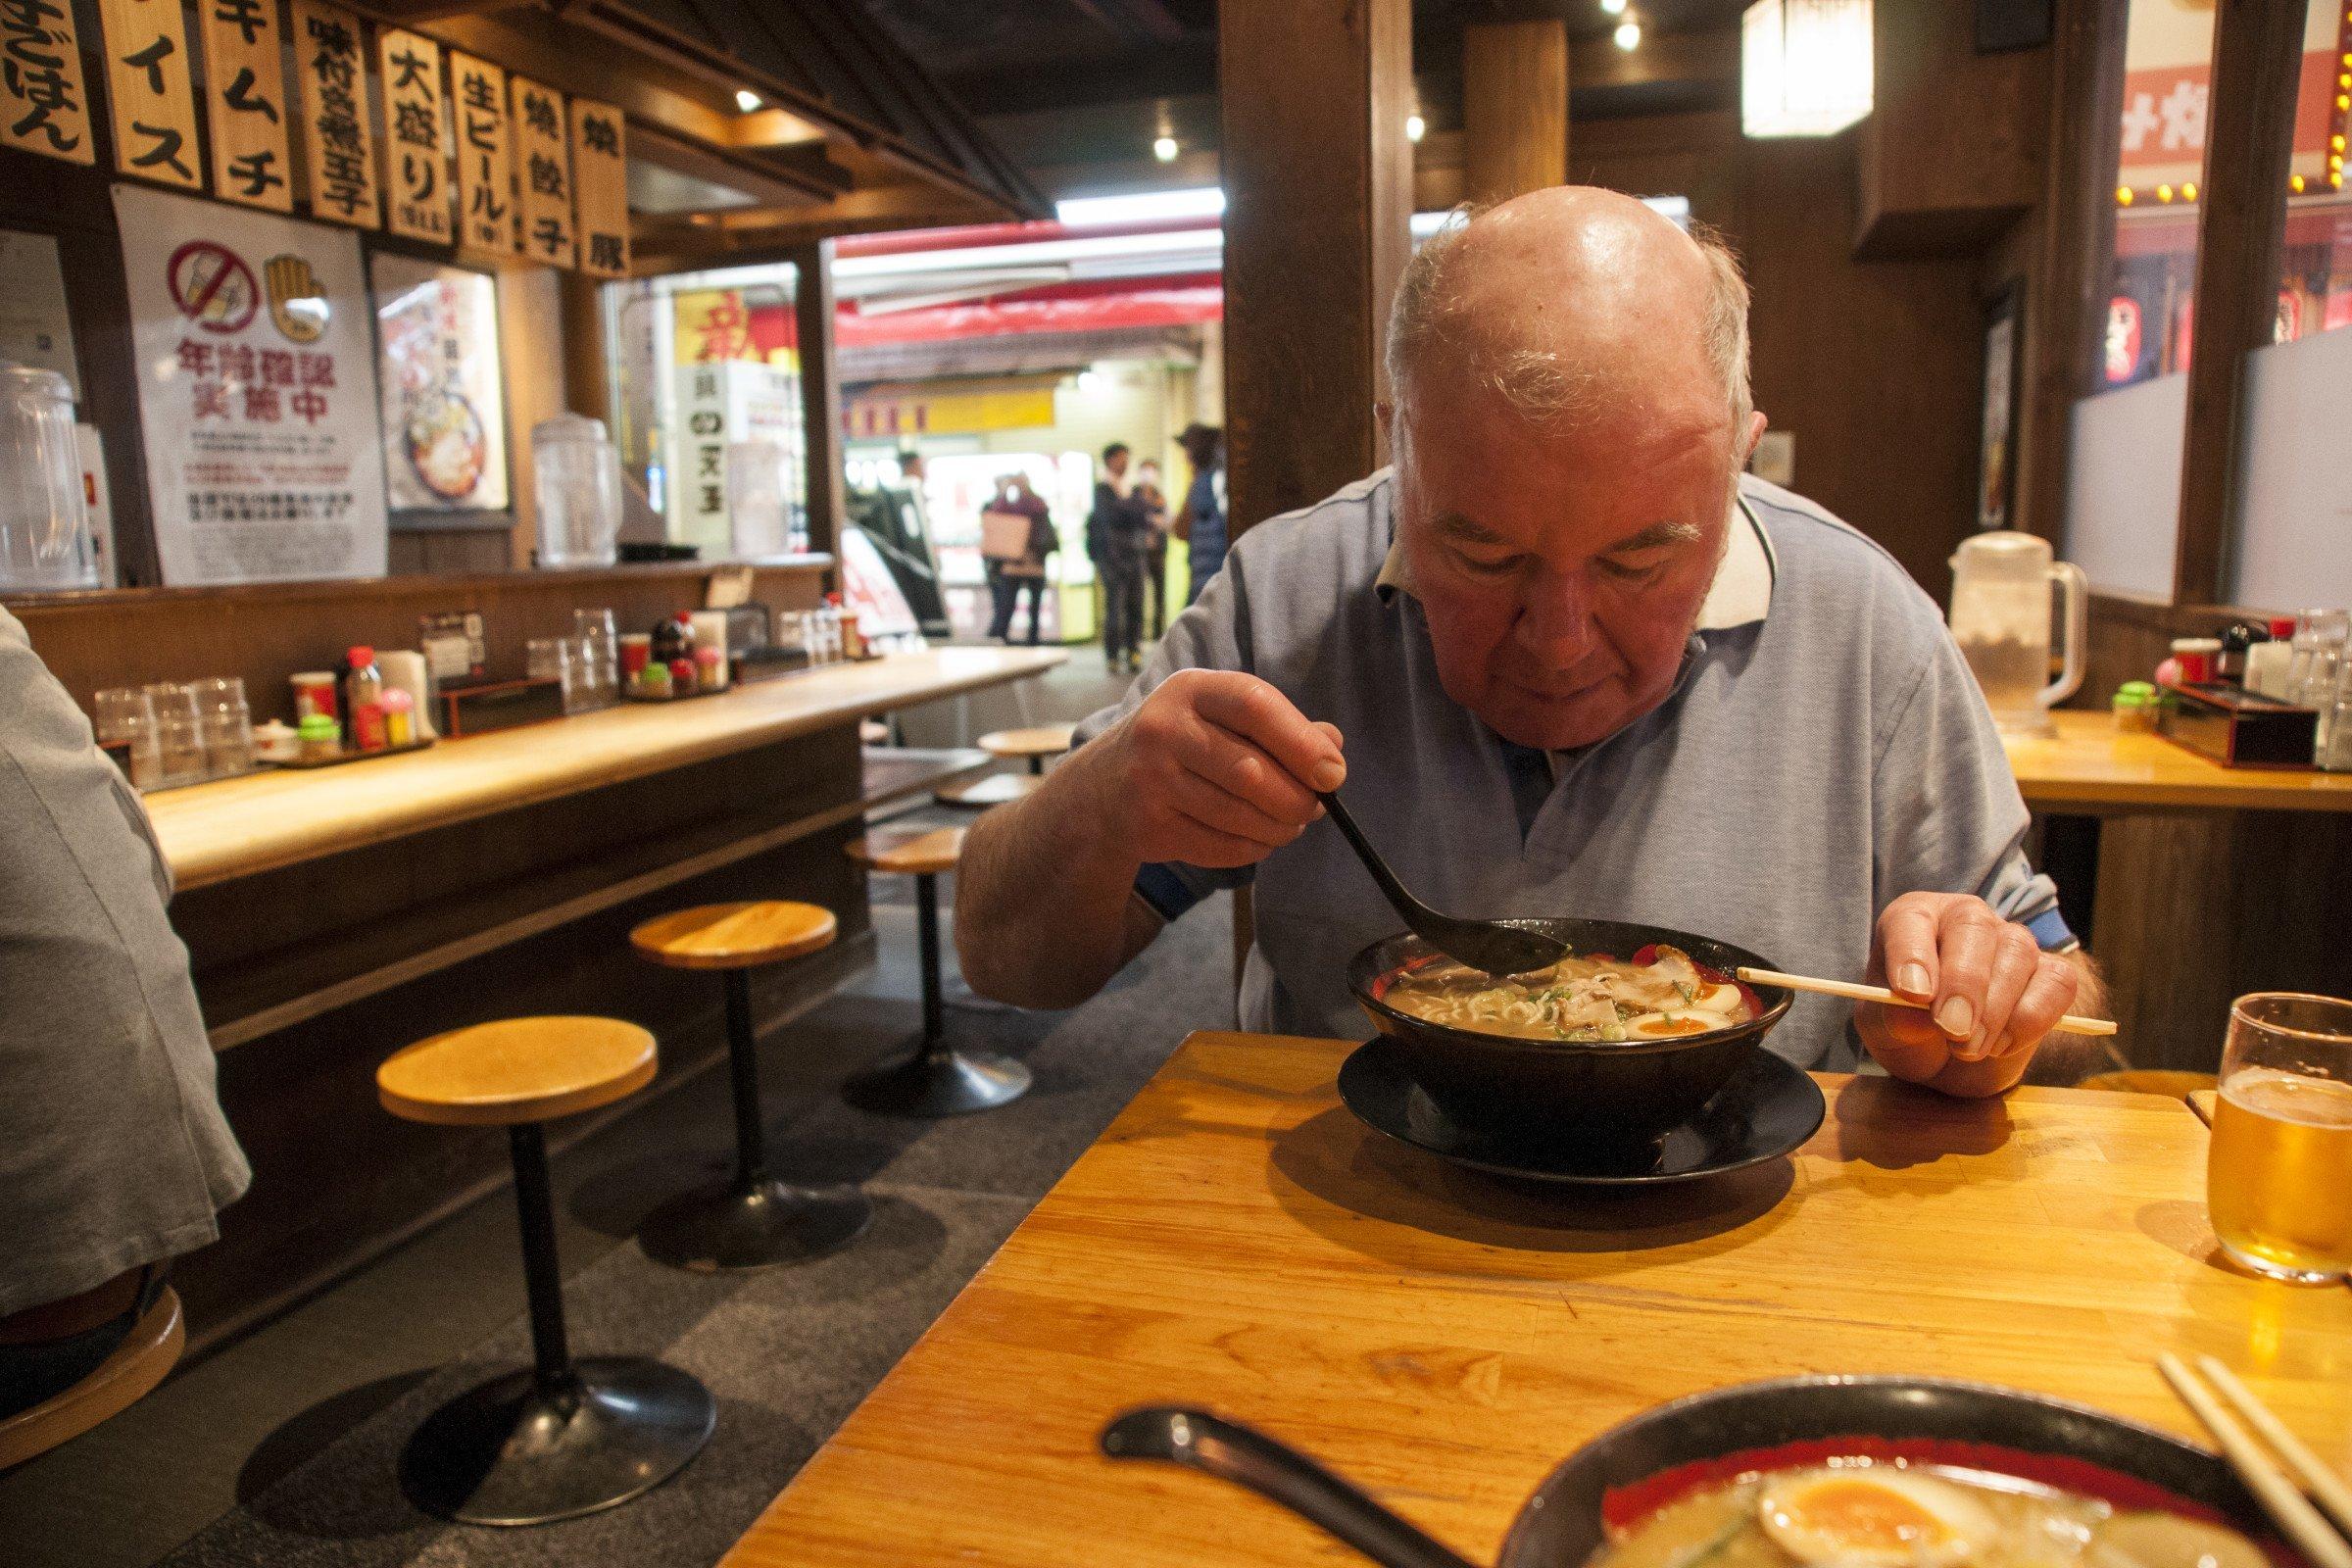 Enjoying a bowl of ramen